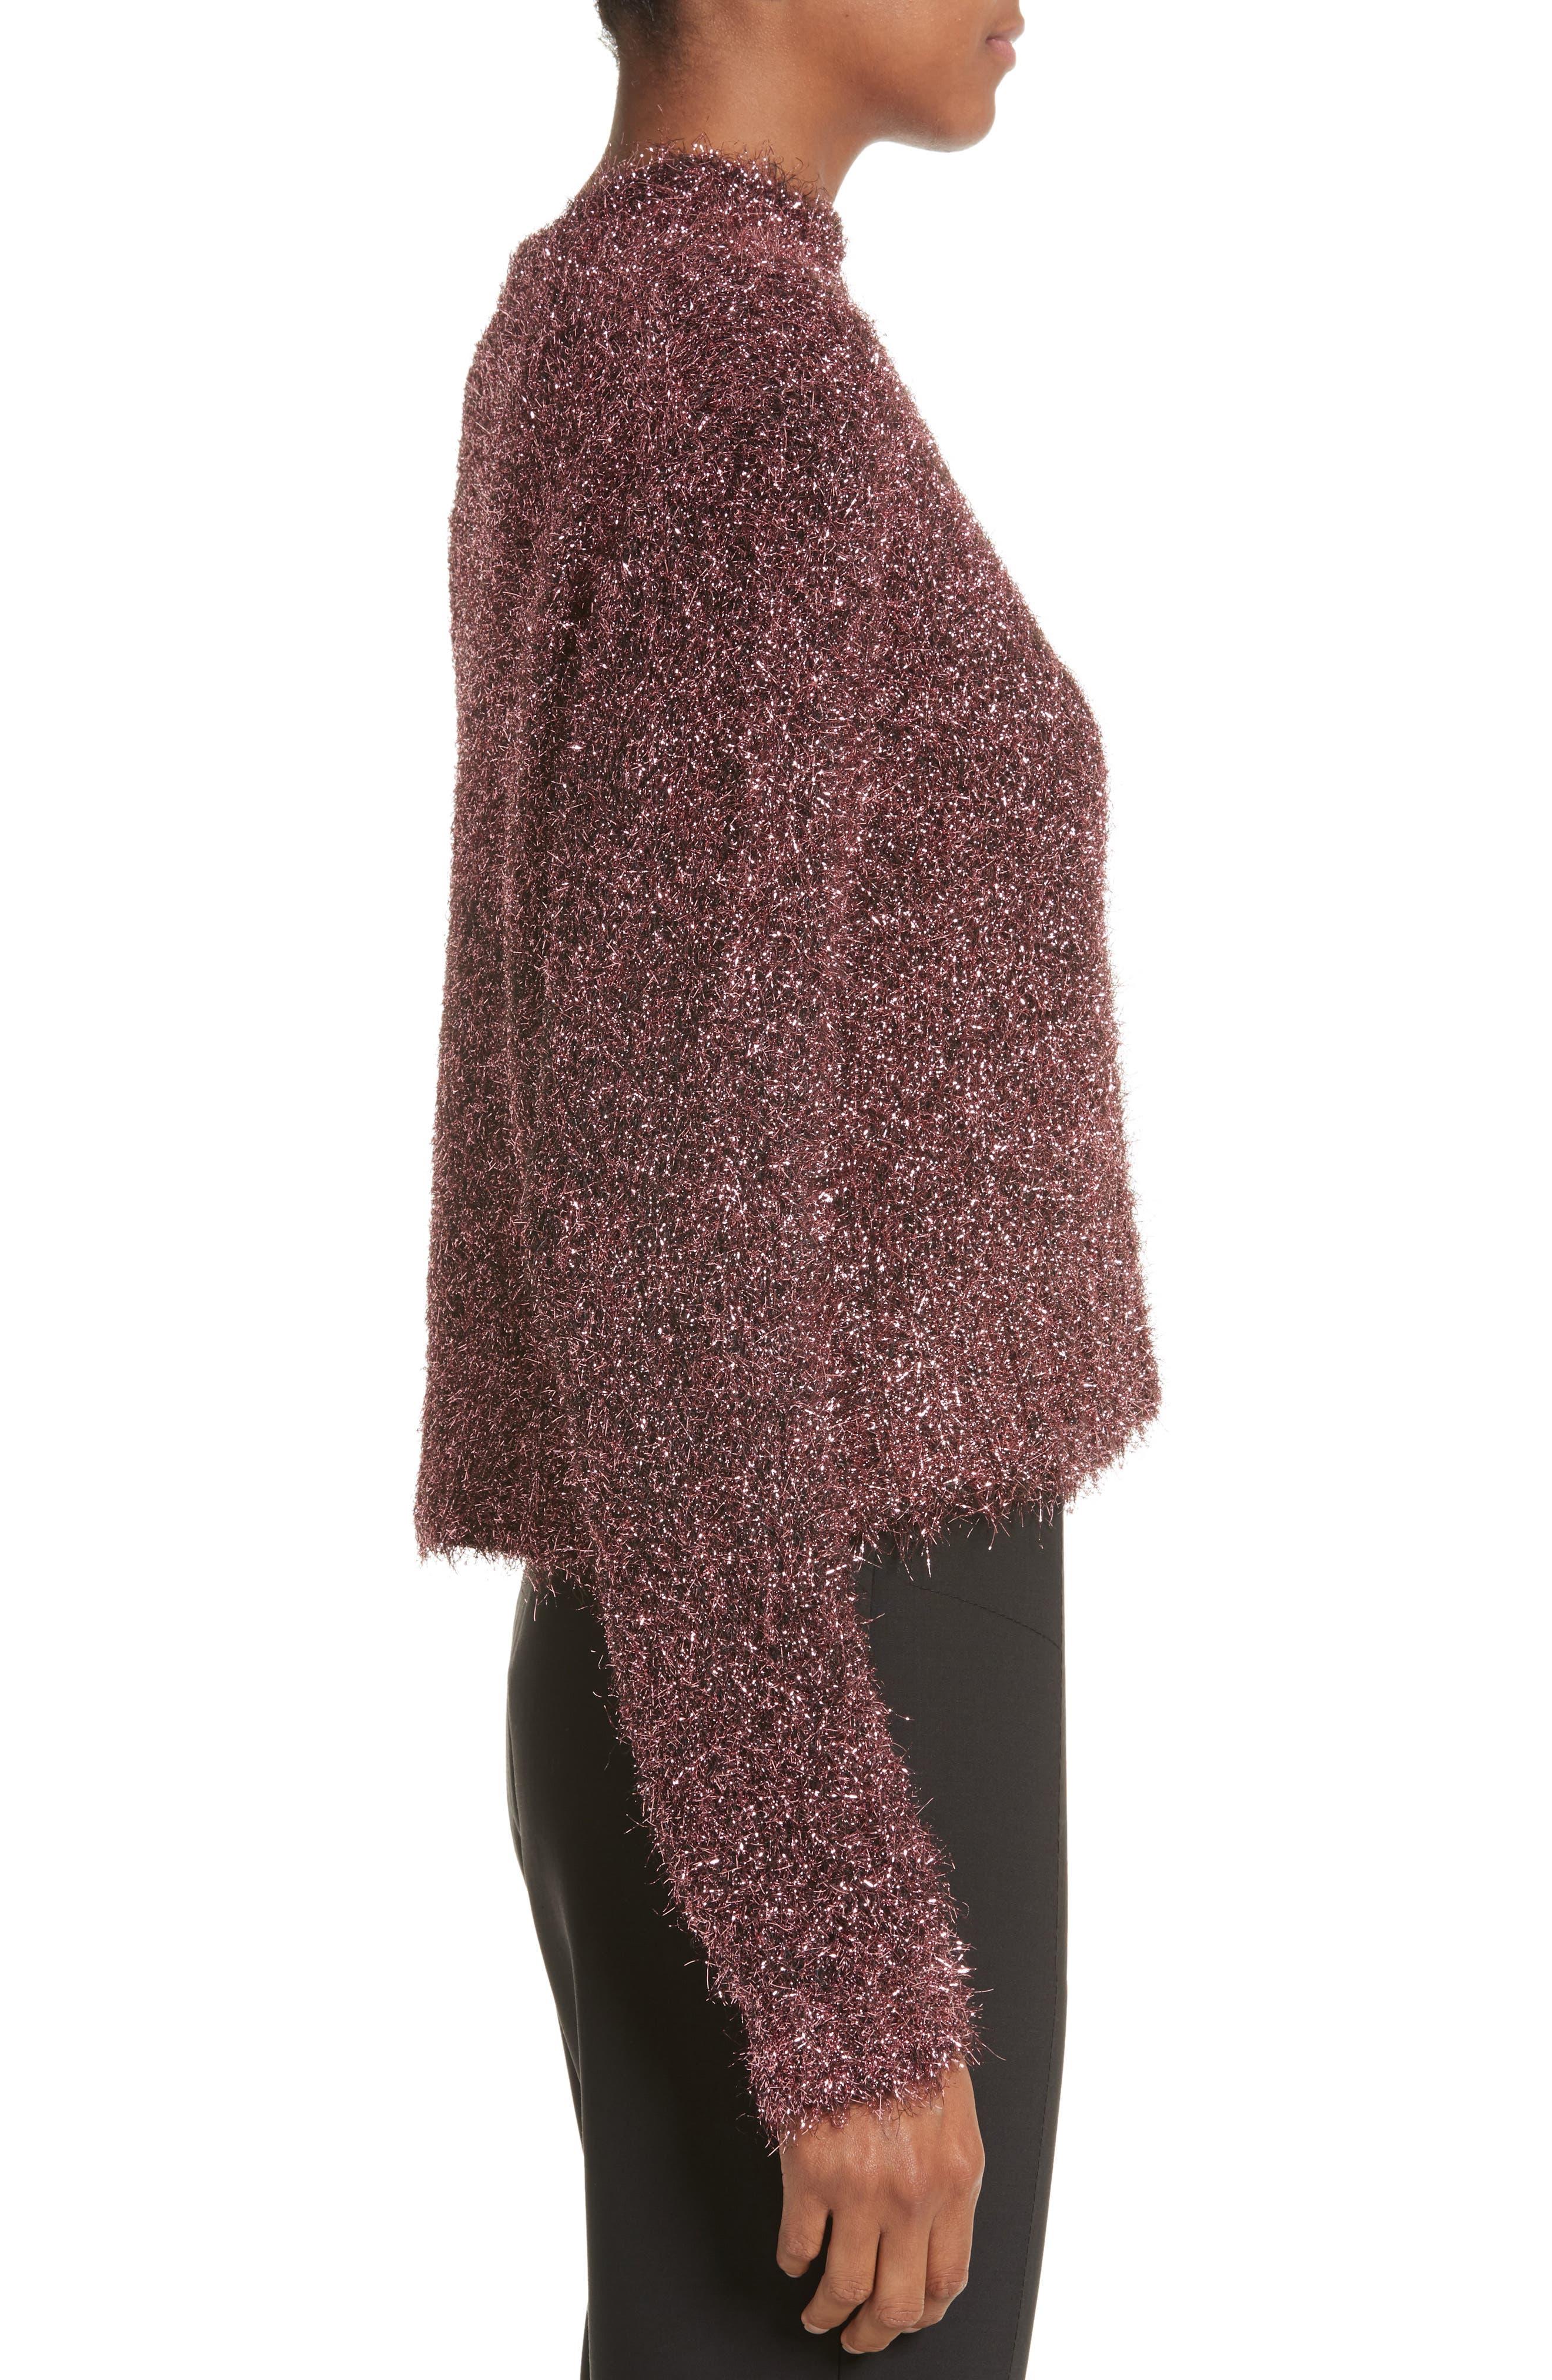 Vaporize Textured Metallic Sweater,                             Alternate thumbnail 3, color,                             Pink